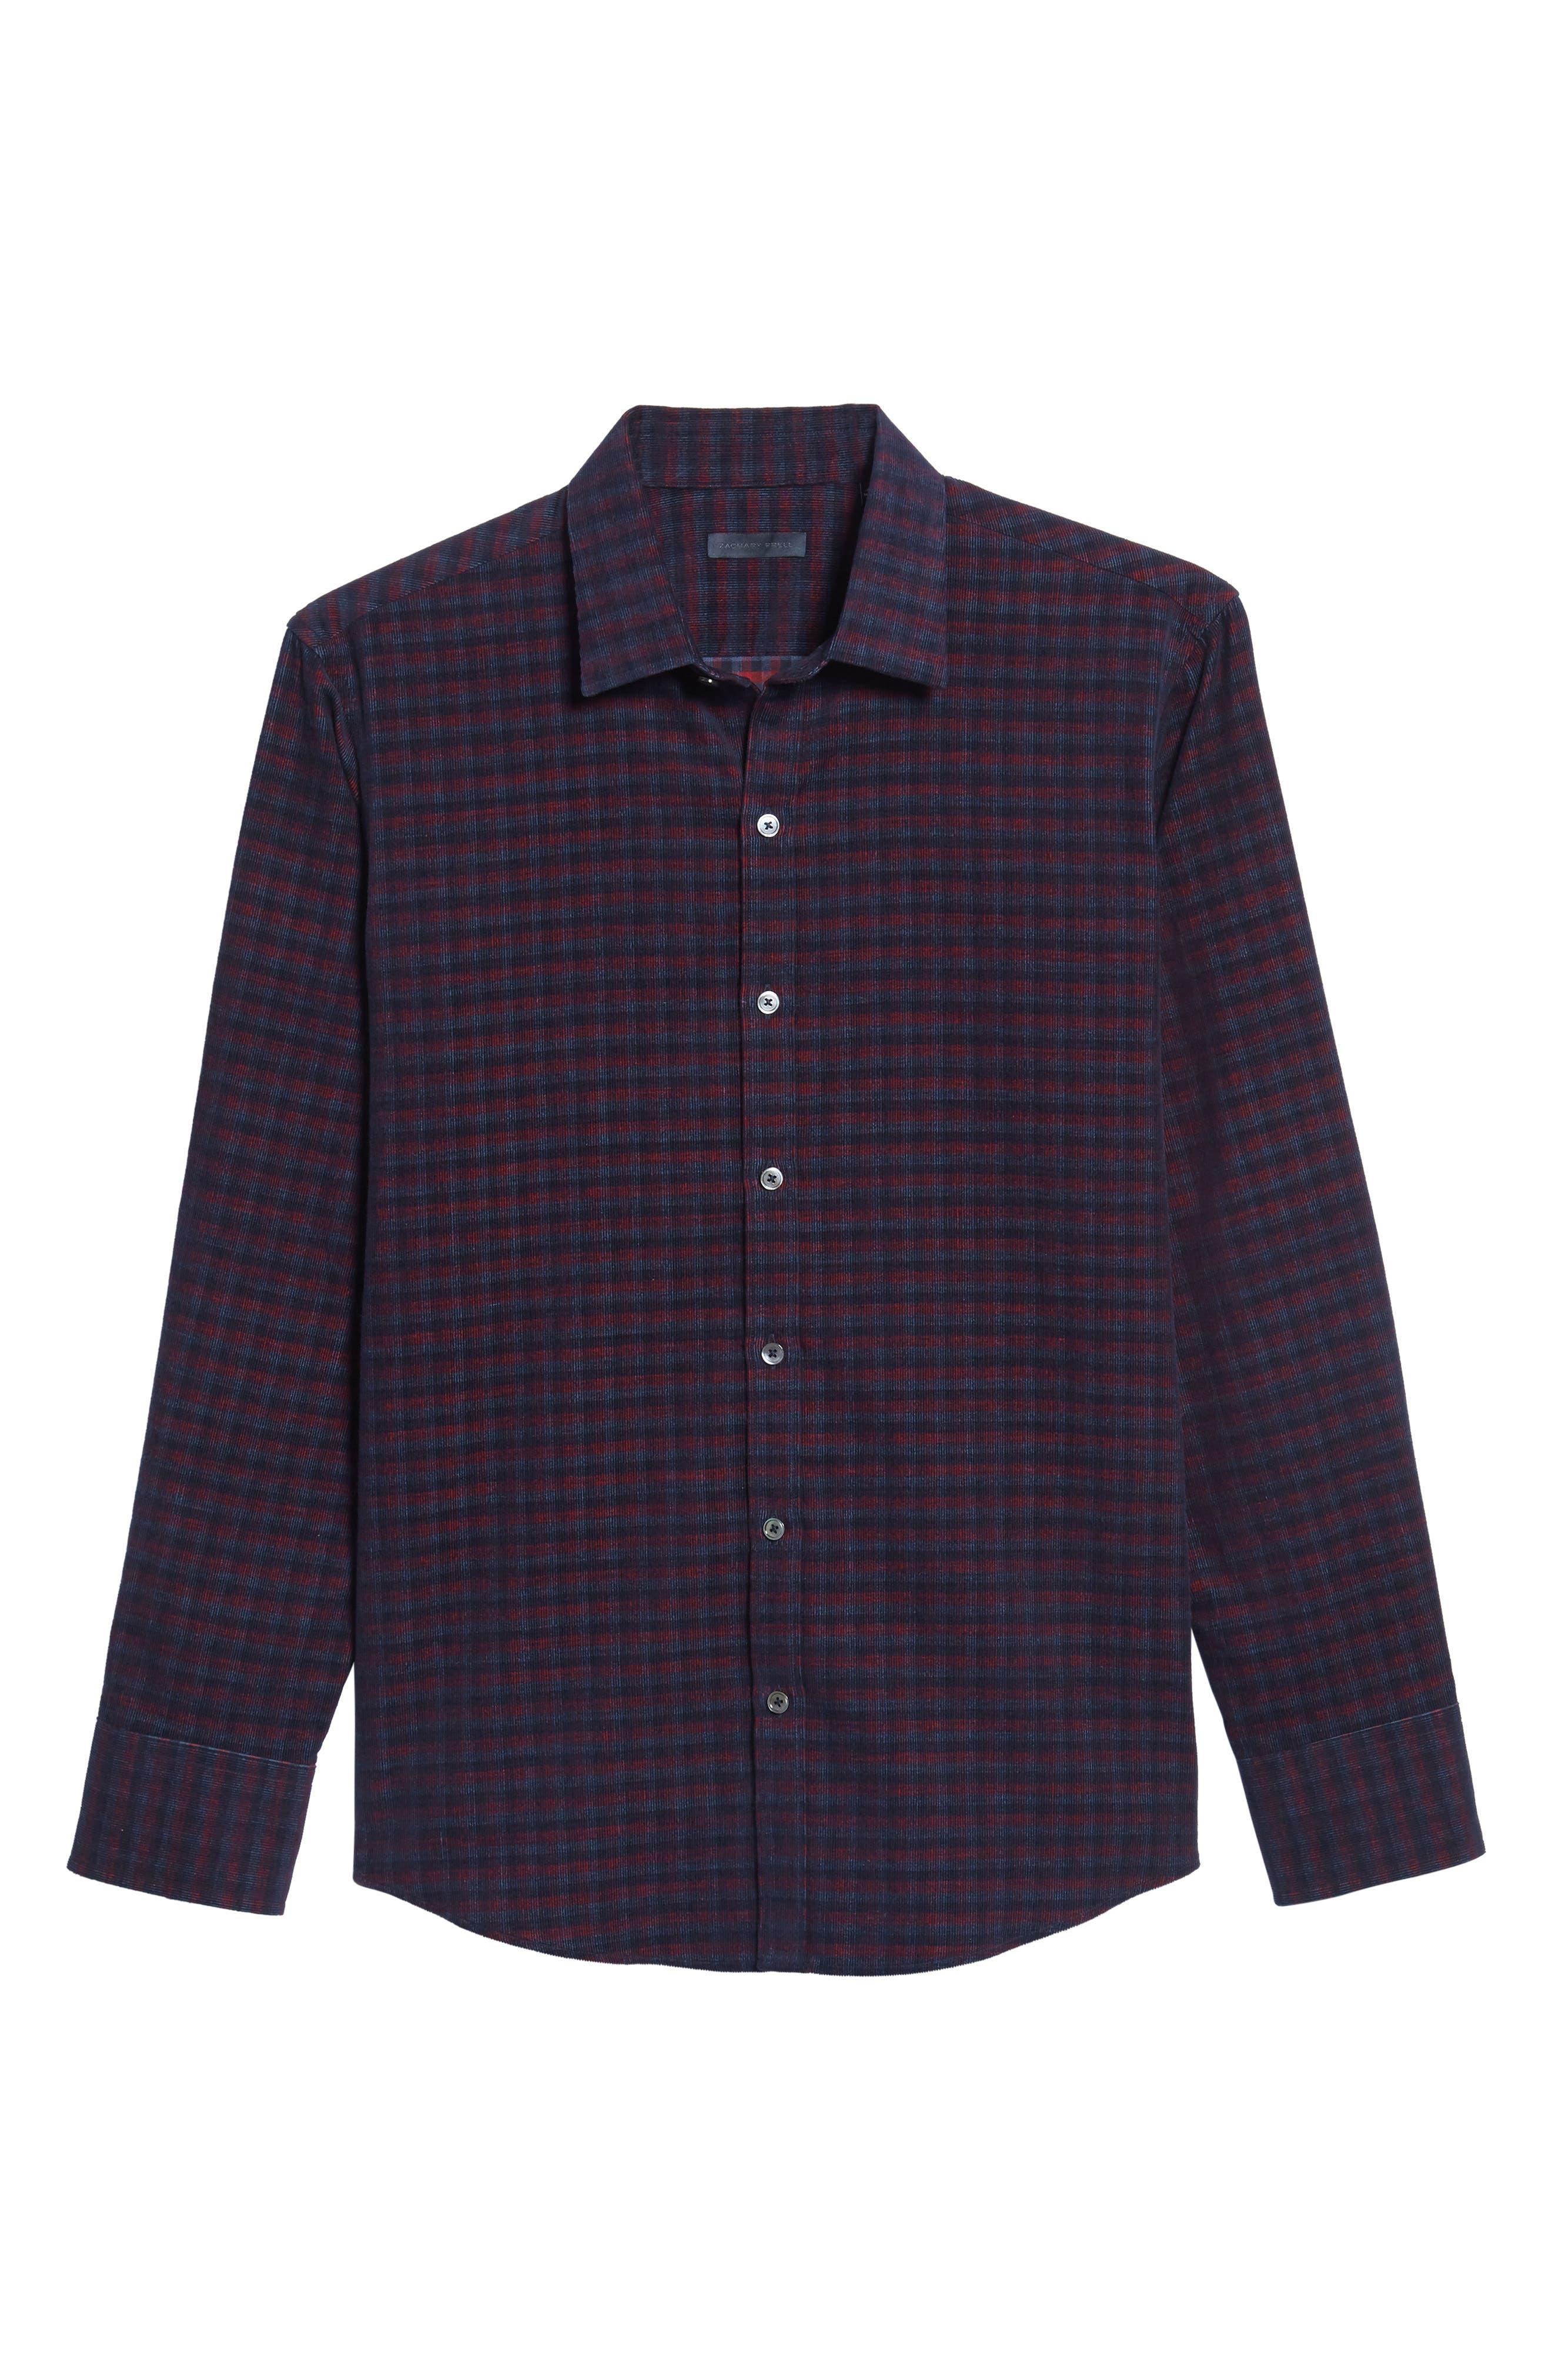 Byas Check Corduroy Sport Shirt,                             Alternate thumbnail 6, color,                             410